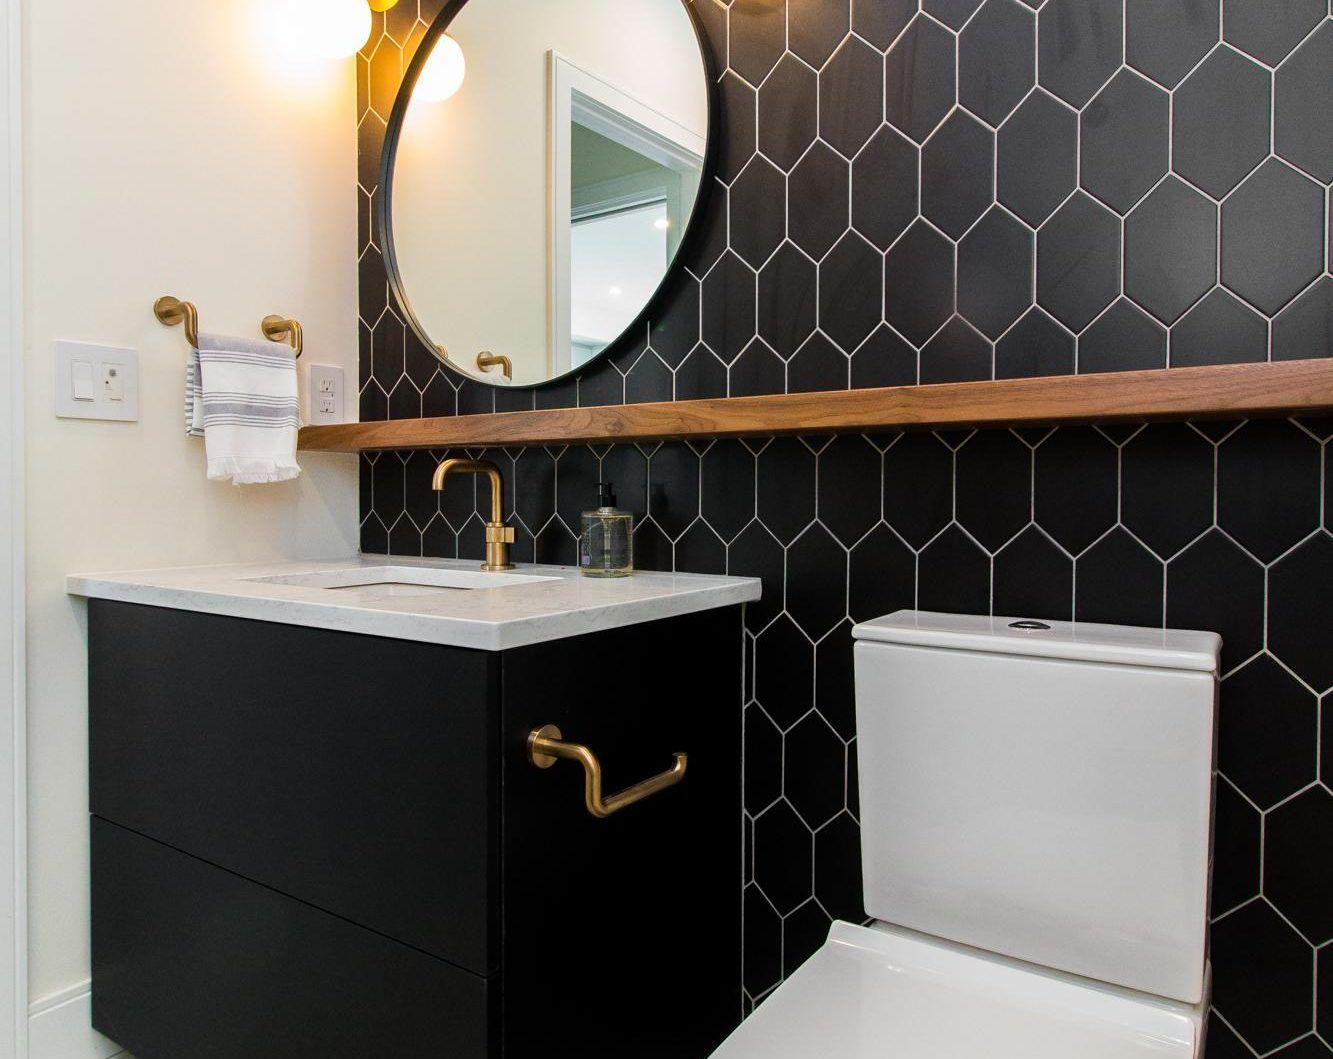 Northern Lights Interior Design Portfolio Winnipeg Black And Wood Powder Room With Lighting Design Interior Interior Design Portfolio Round Mirror Bathroom